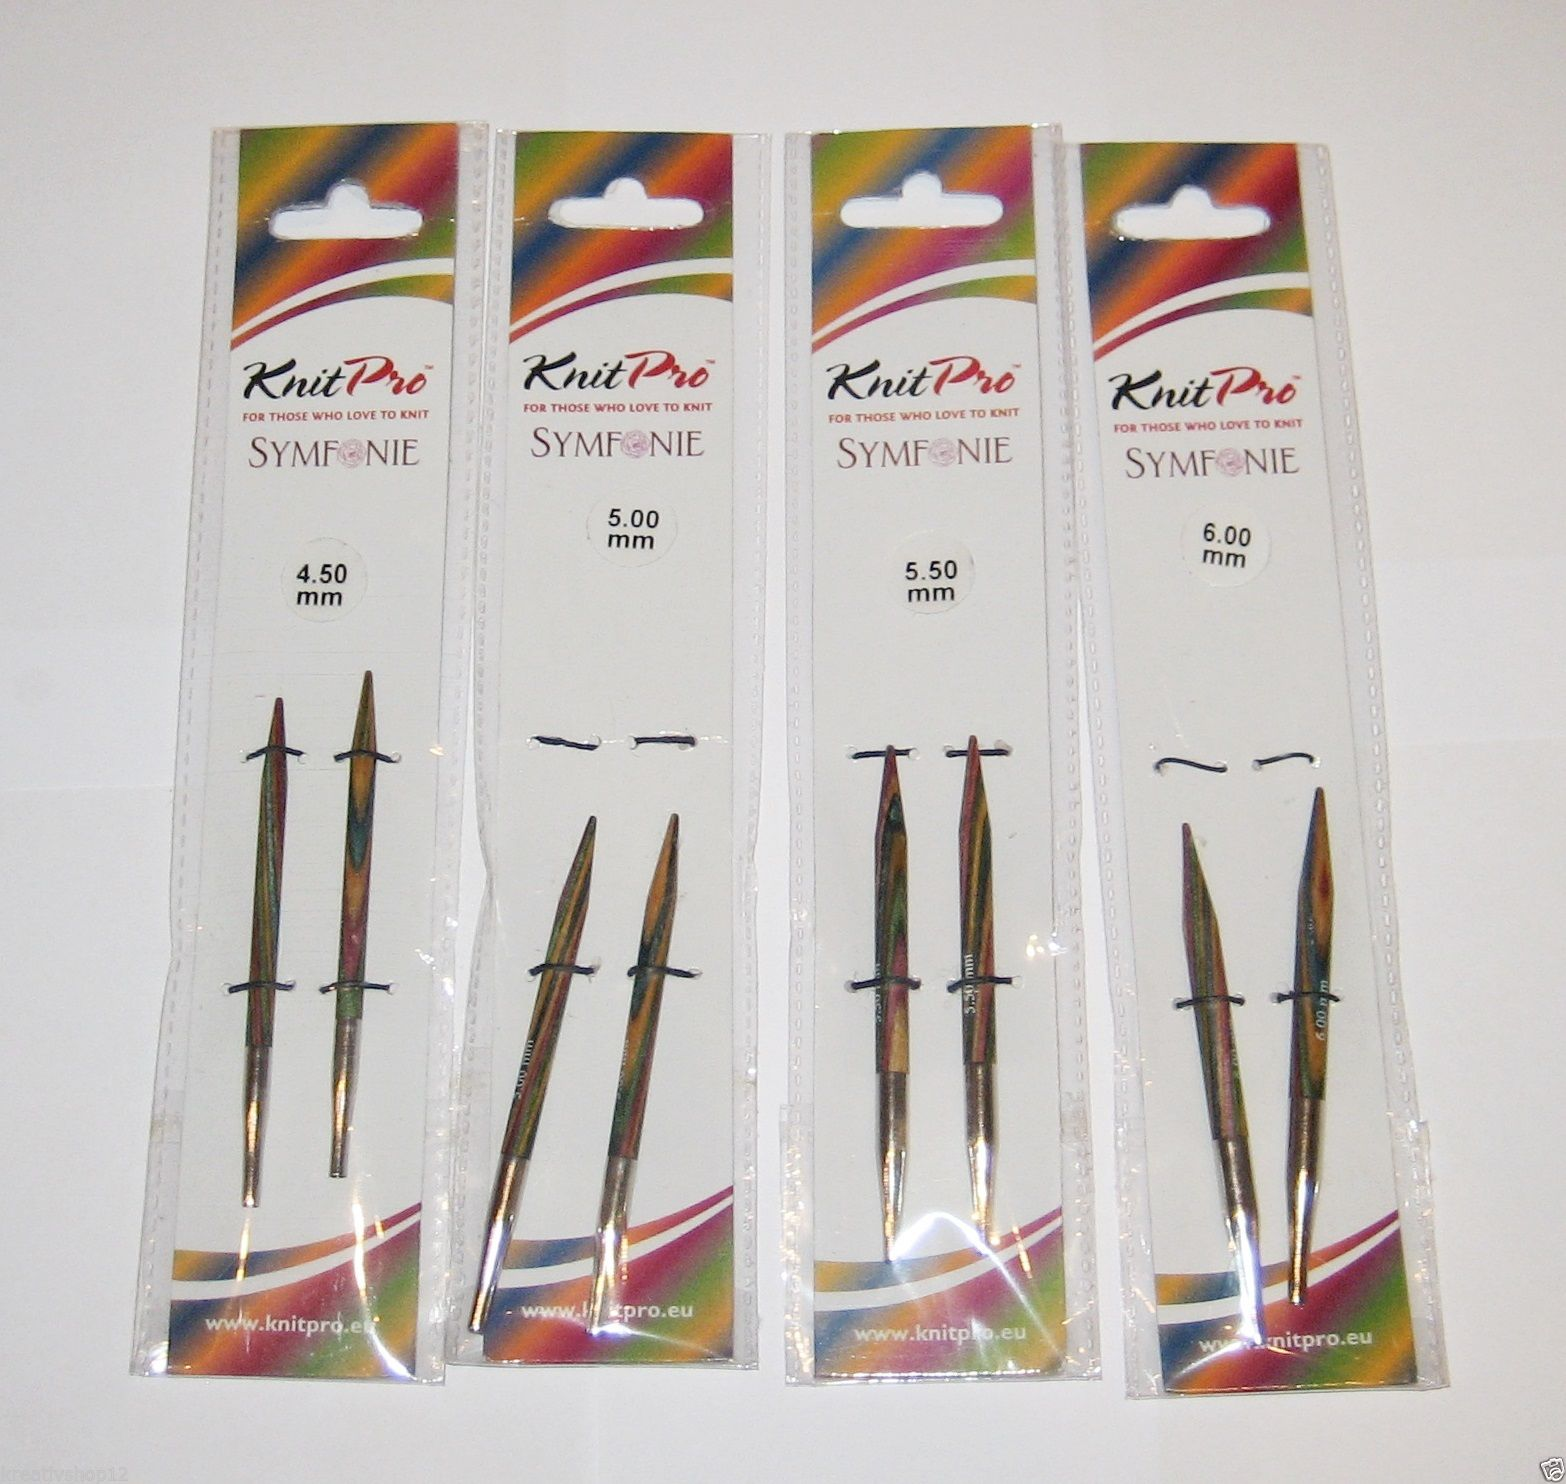 Zing Nadelspitzen ;kurze Länge ~ 95 mm 6,0 mm Knit pro Stärke von 3,0 mm